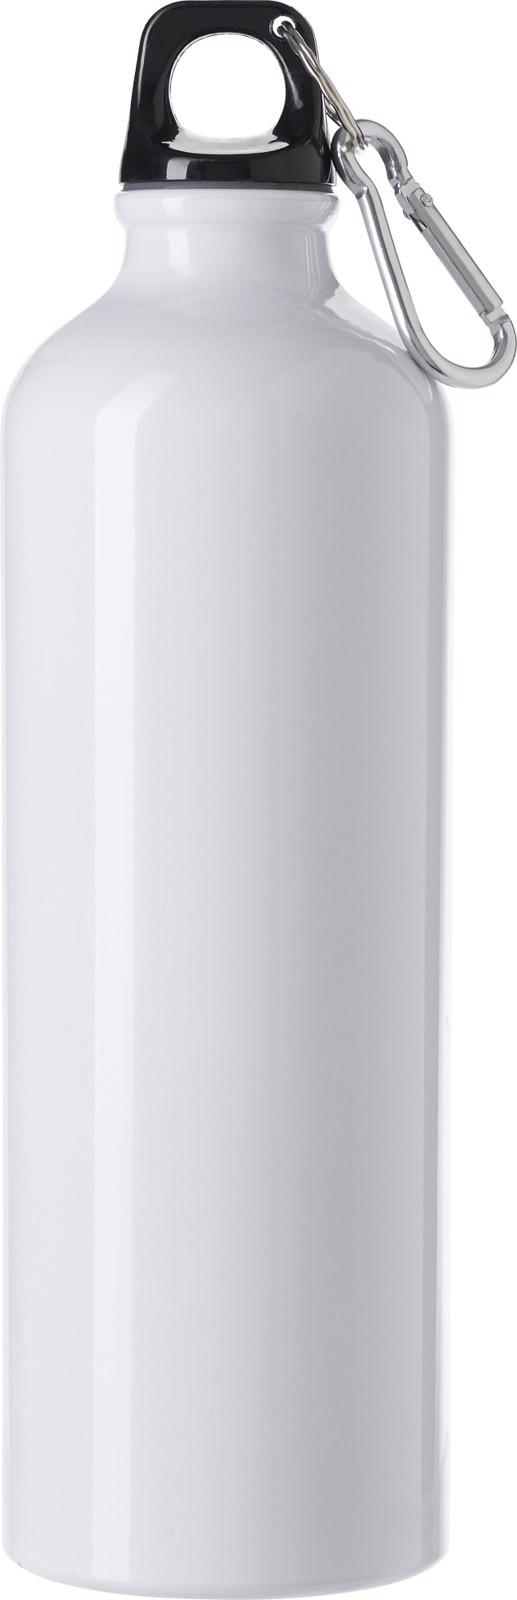 Aluminium flask - White